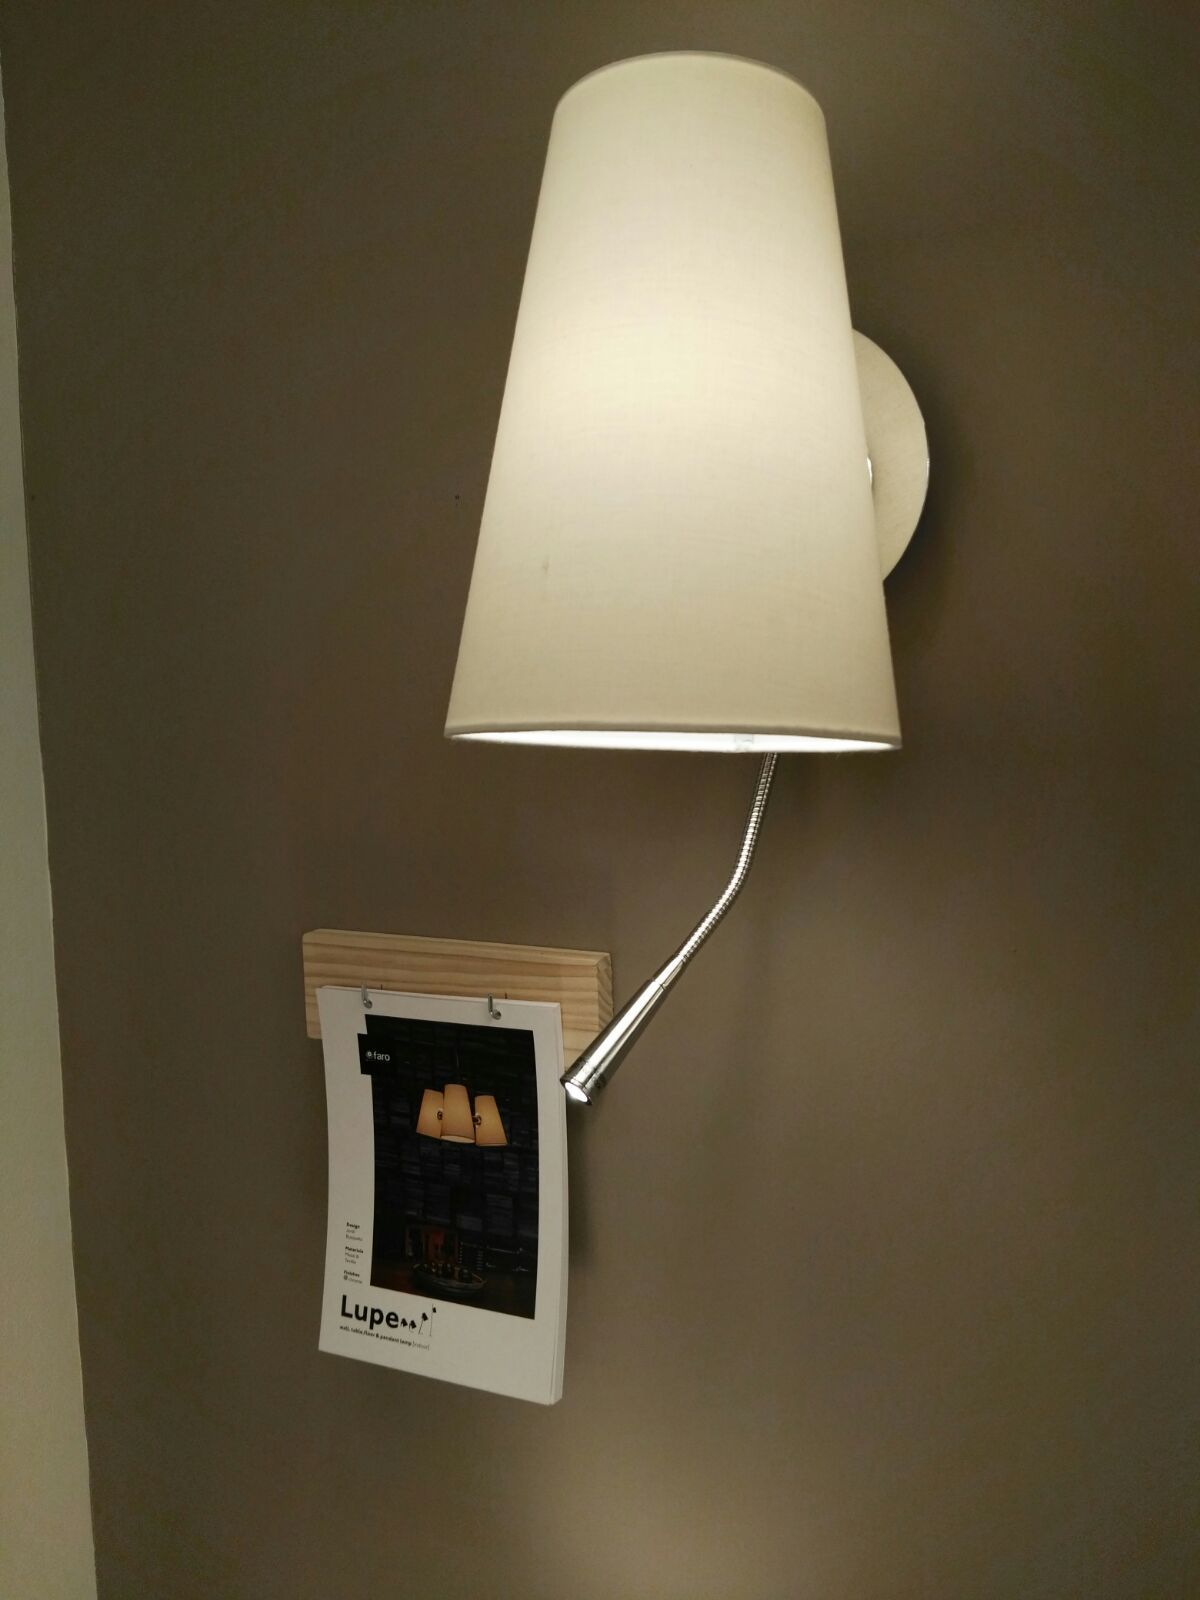 LUPE chrome wall lamp #design | Light+Building 2016 | Pinterest